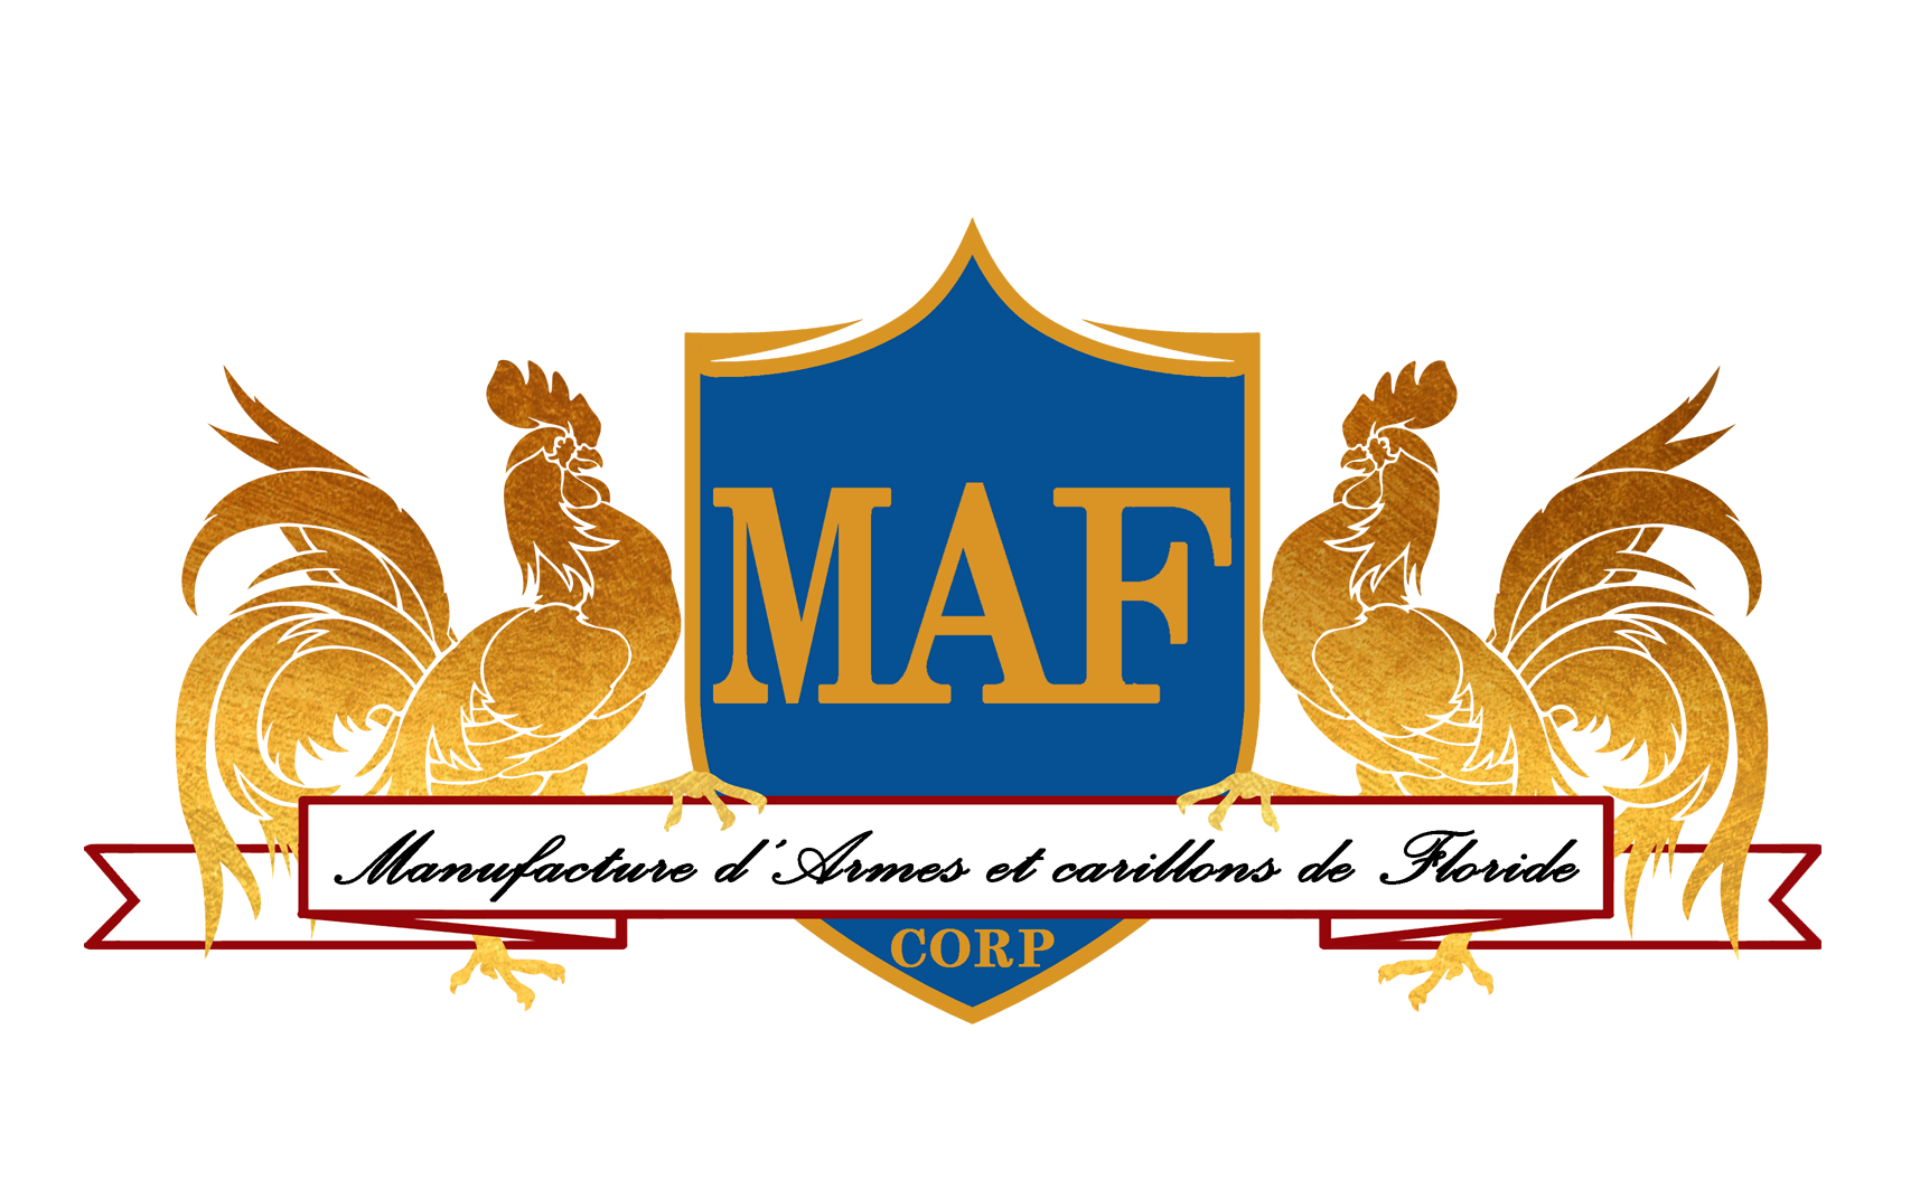 MAF Corp.